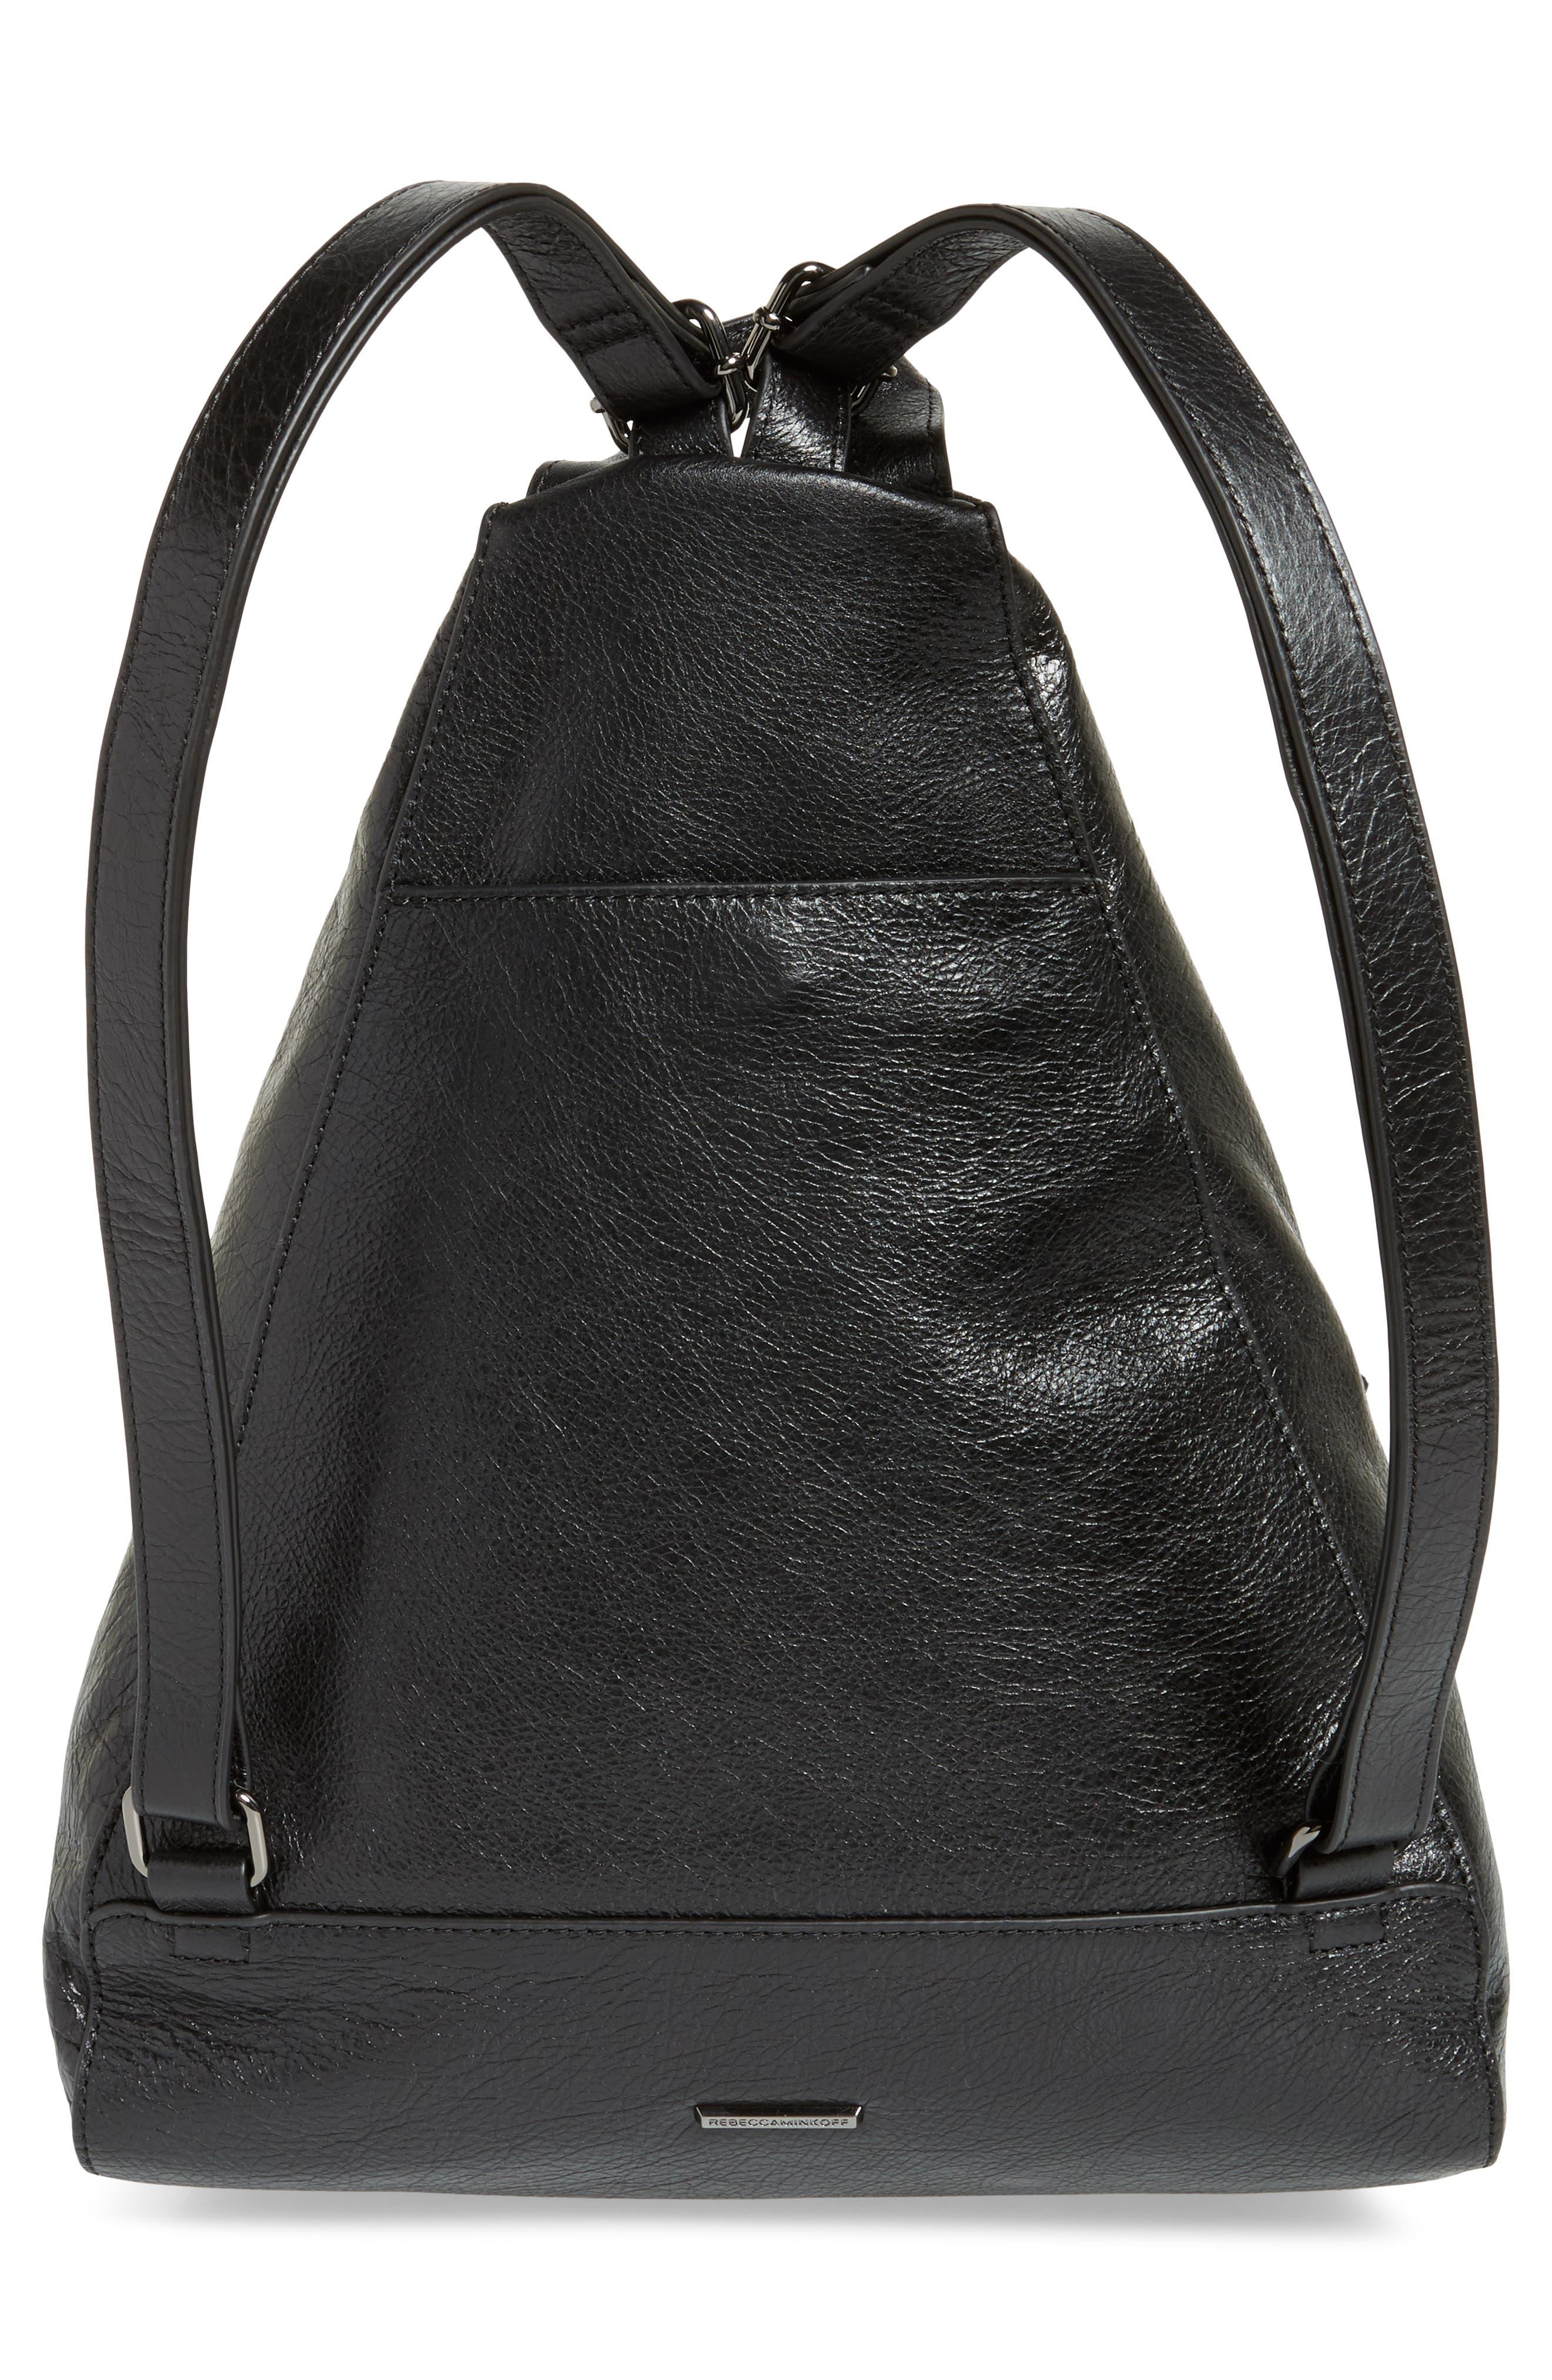 Jamie Leather Backpack,                             Alternate thumbnail 3, color,                             Black